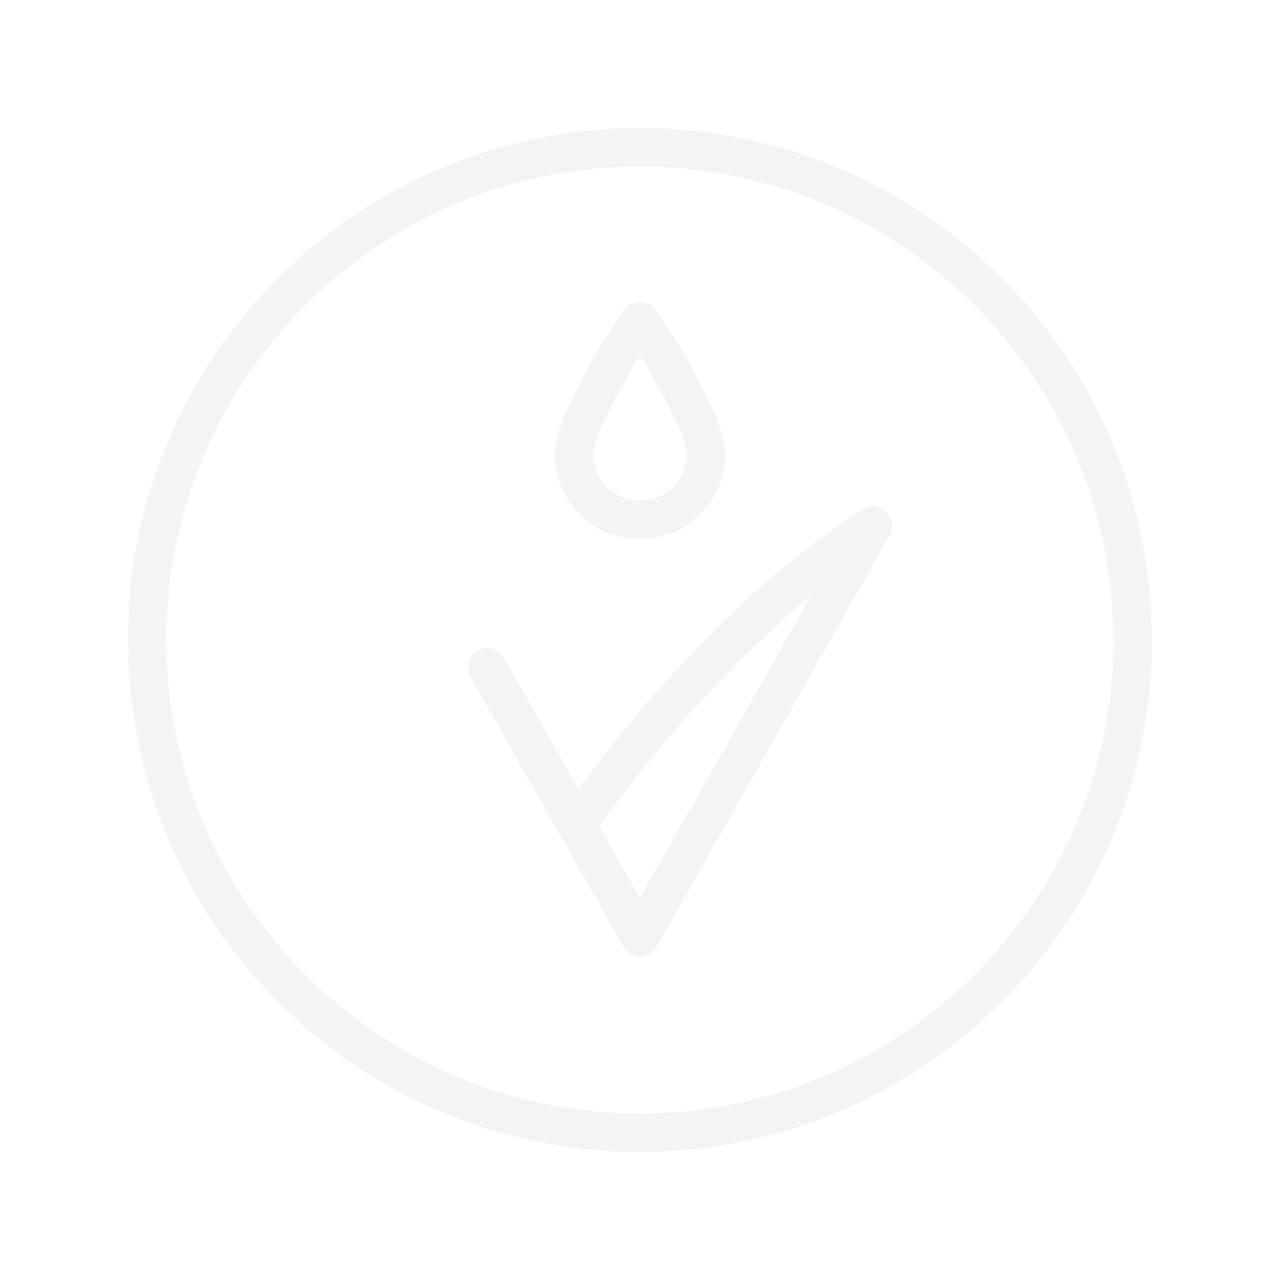 THEBALM Meet Matt Trimony Eyeshadow Palette 21.6g